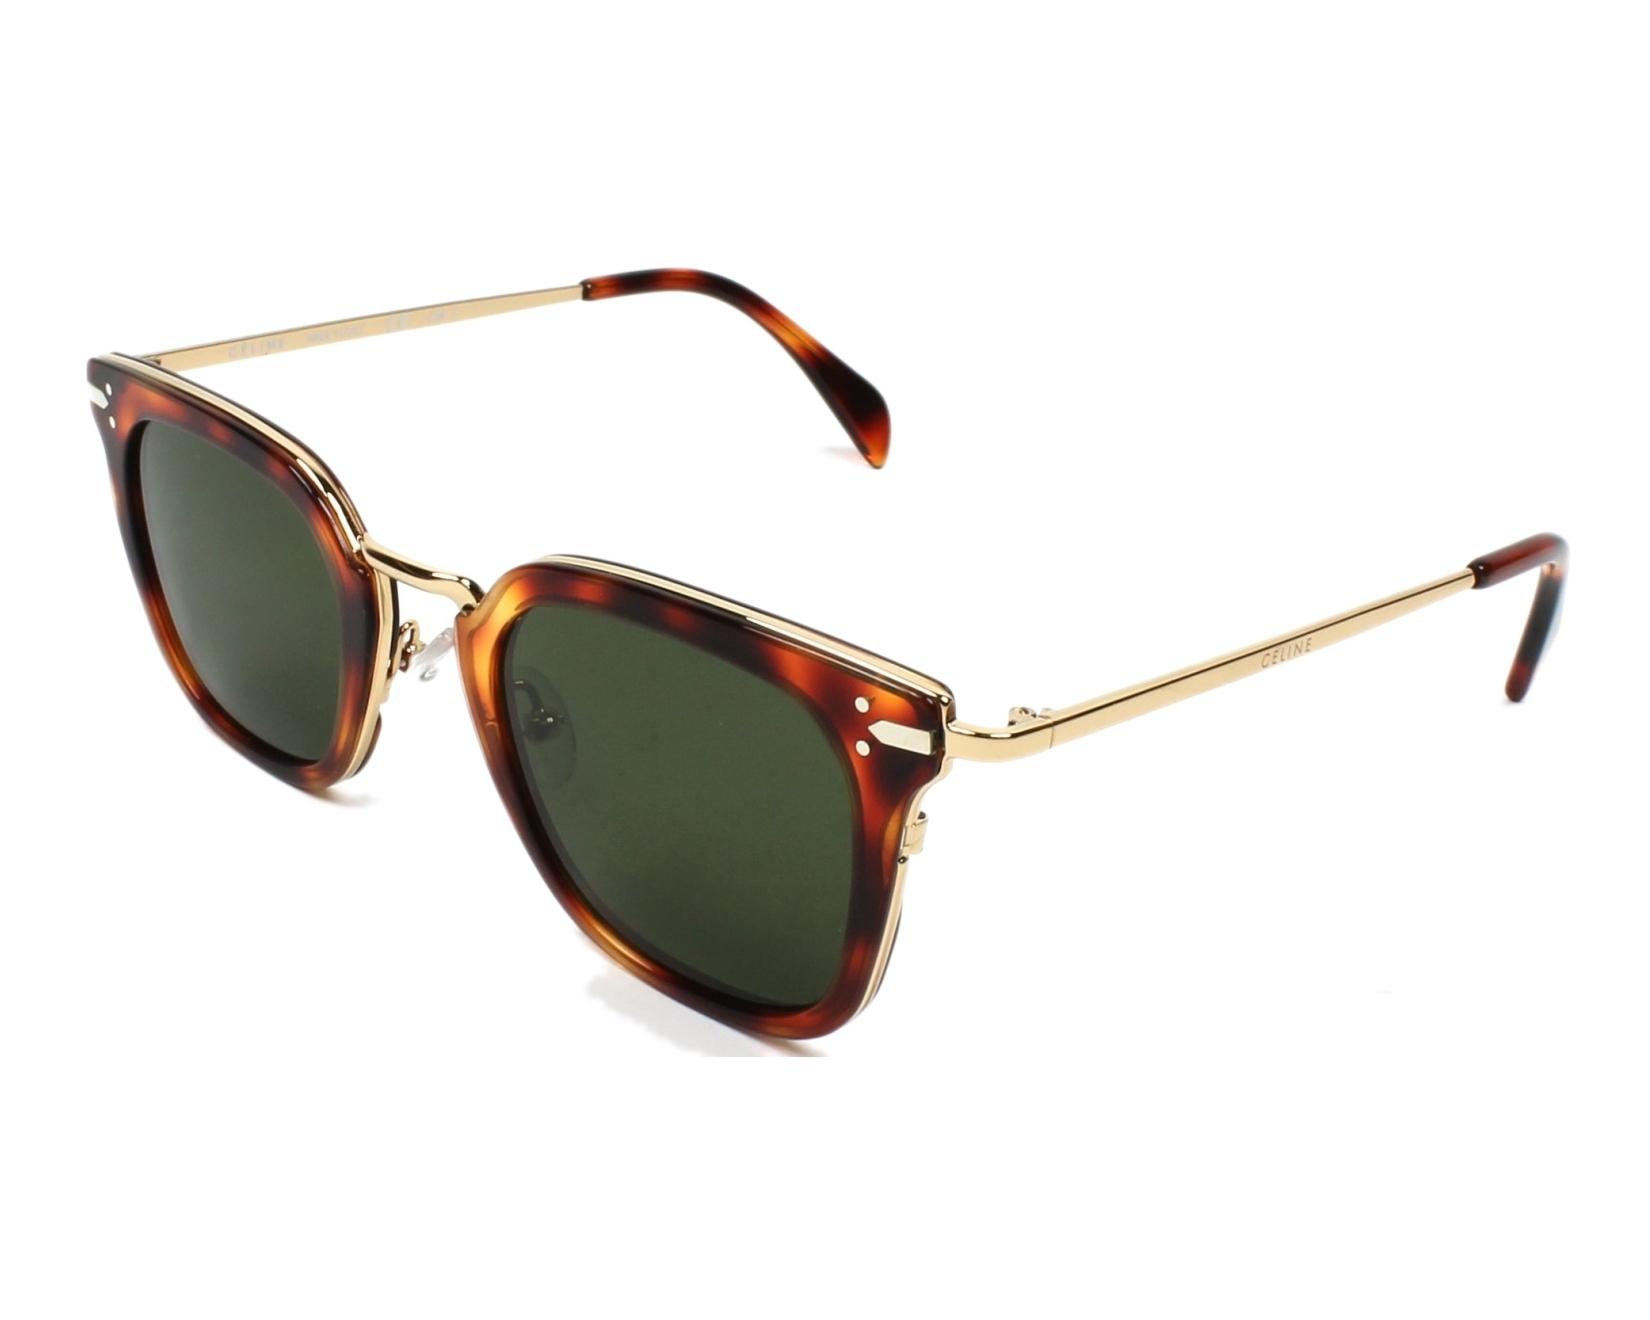 510115a0e39 Sunglasses Céline CL-41402 3UA 1E 47-25 Havana Gold profile view